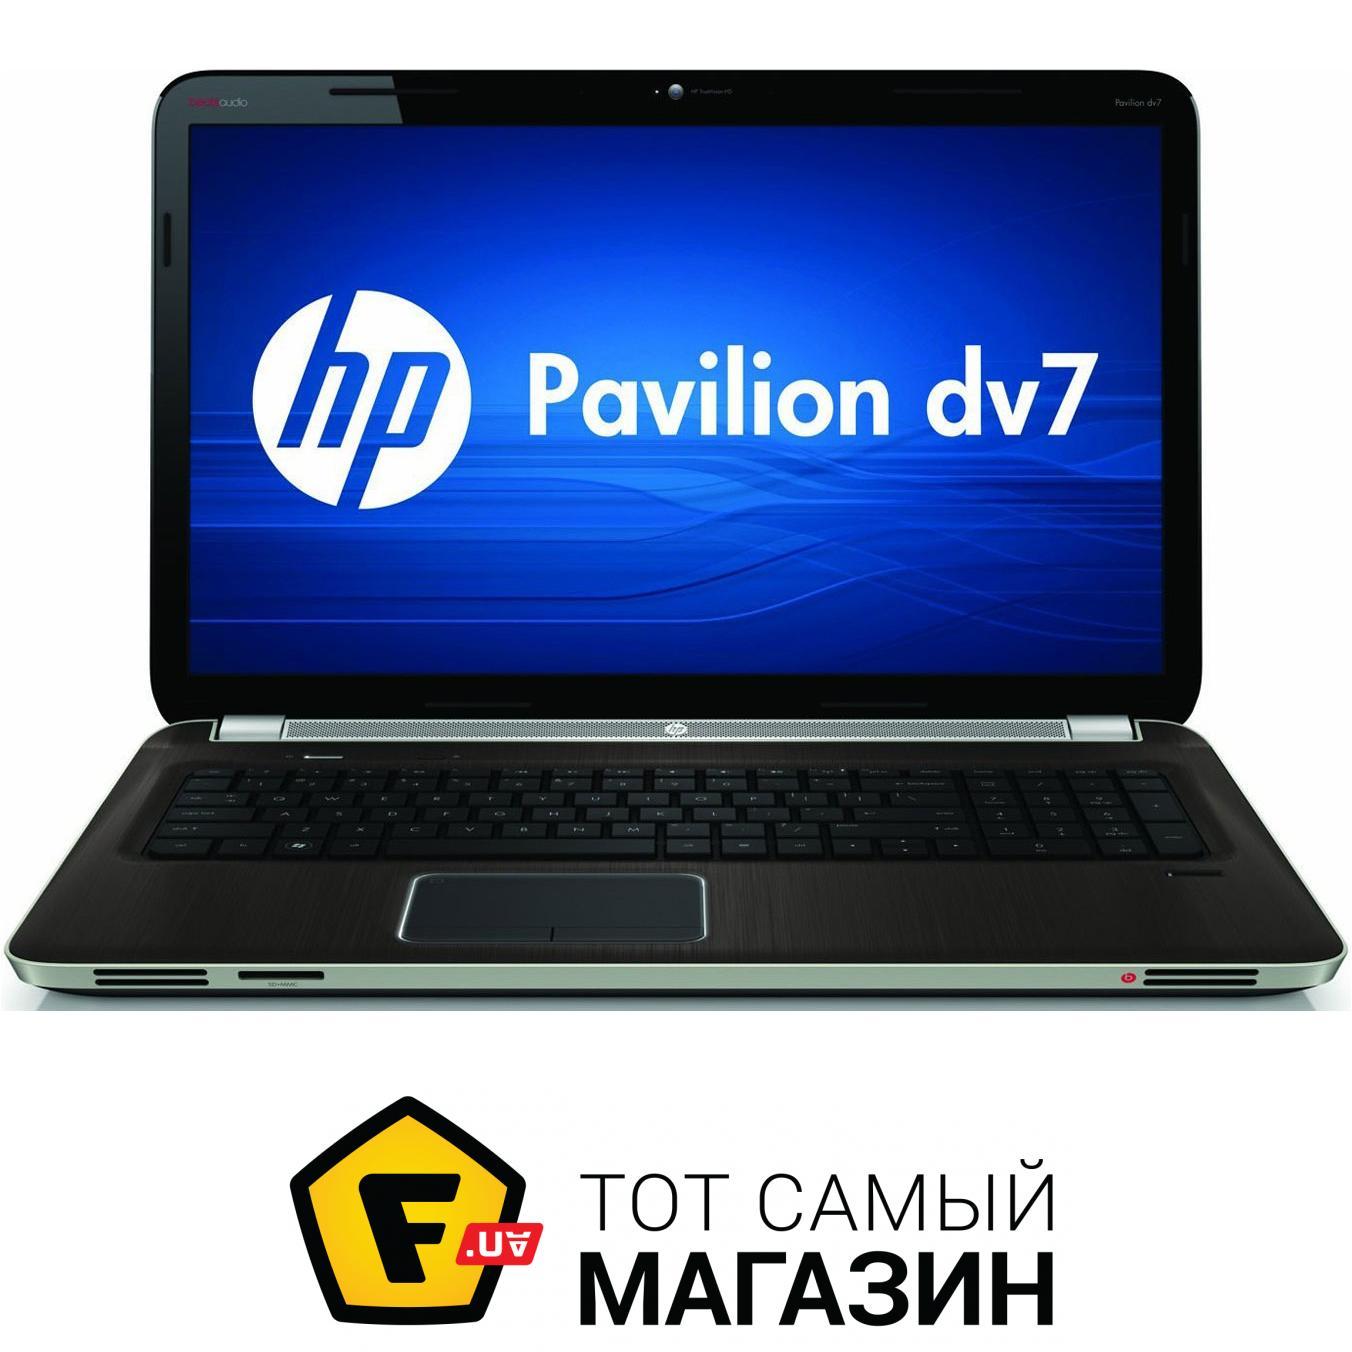 Ноутбук Dell Vostro 5459 5459-0601 (Intel Core i3-6100U 2.3 GHz/4096Mb/500Gb/No ODD/nVidia GeForce 930M 2048Mb/Wi-Fi/Bluetooth/Cam/14.0/1366x768/Windows 10 64-bit)